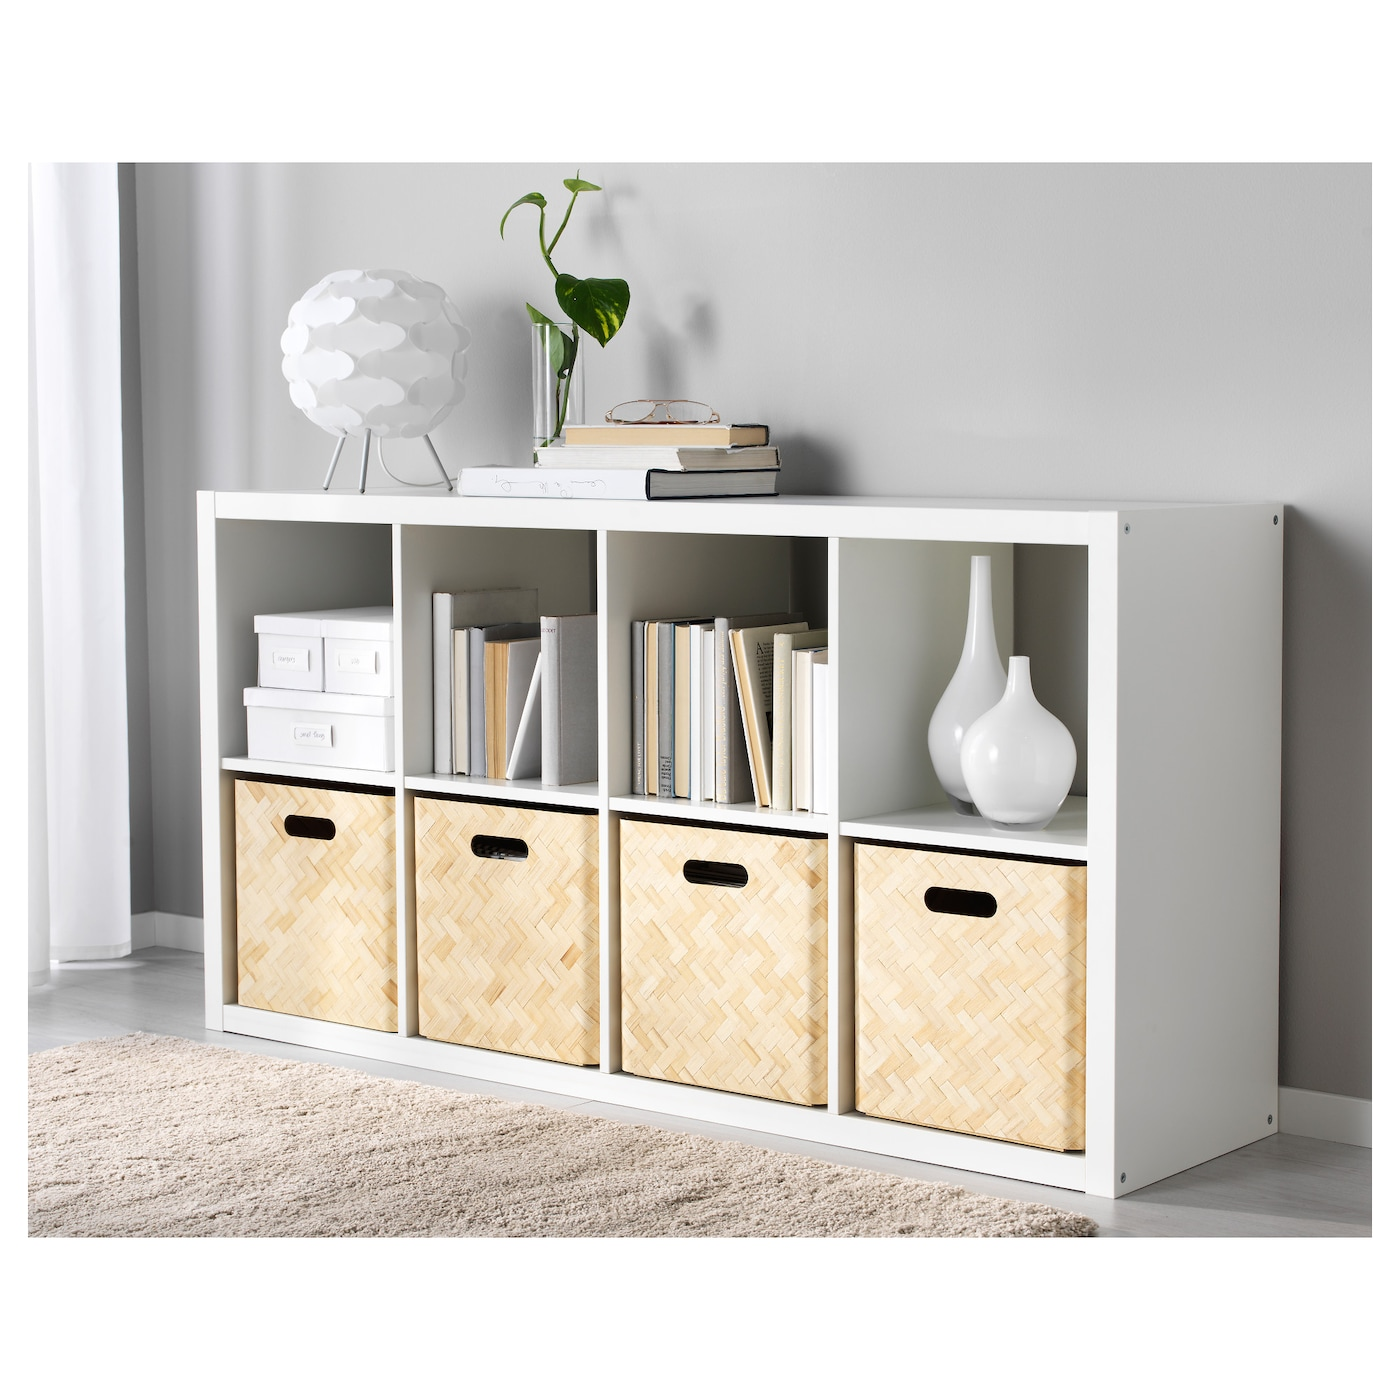 bullig box bamboo 32 x 35 x 33 cm ikea. Black Bedroom Furniture Sets. Home Design Ideas